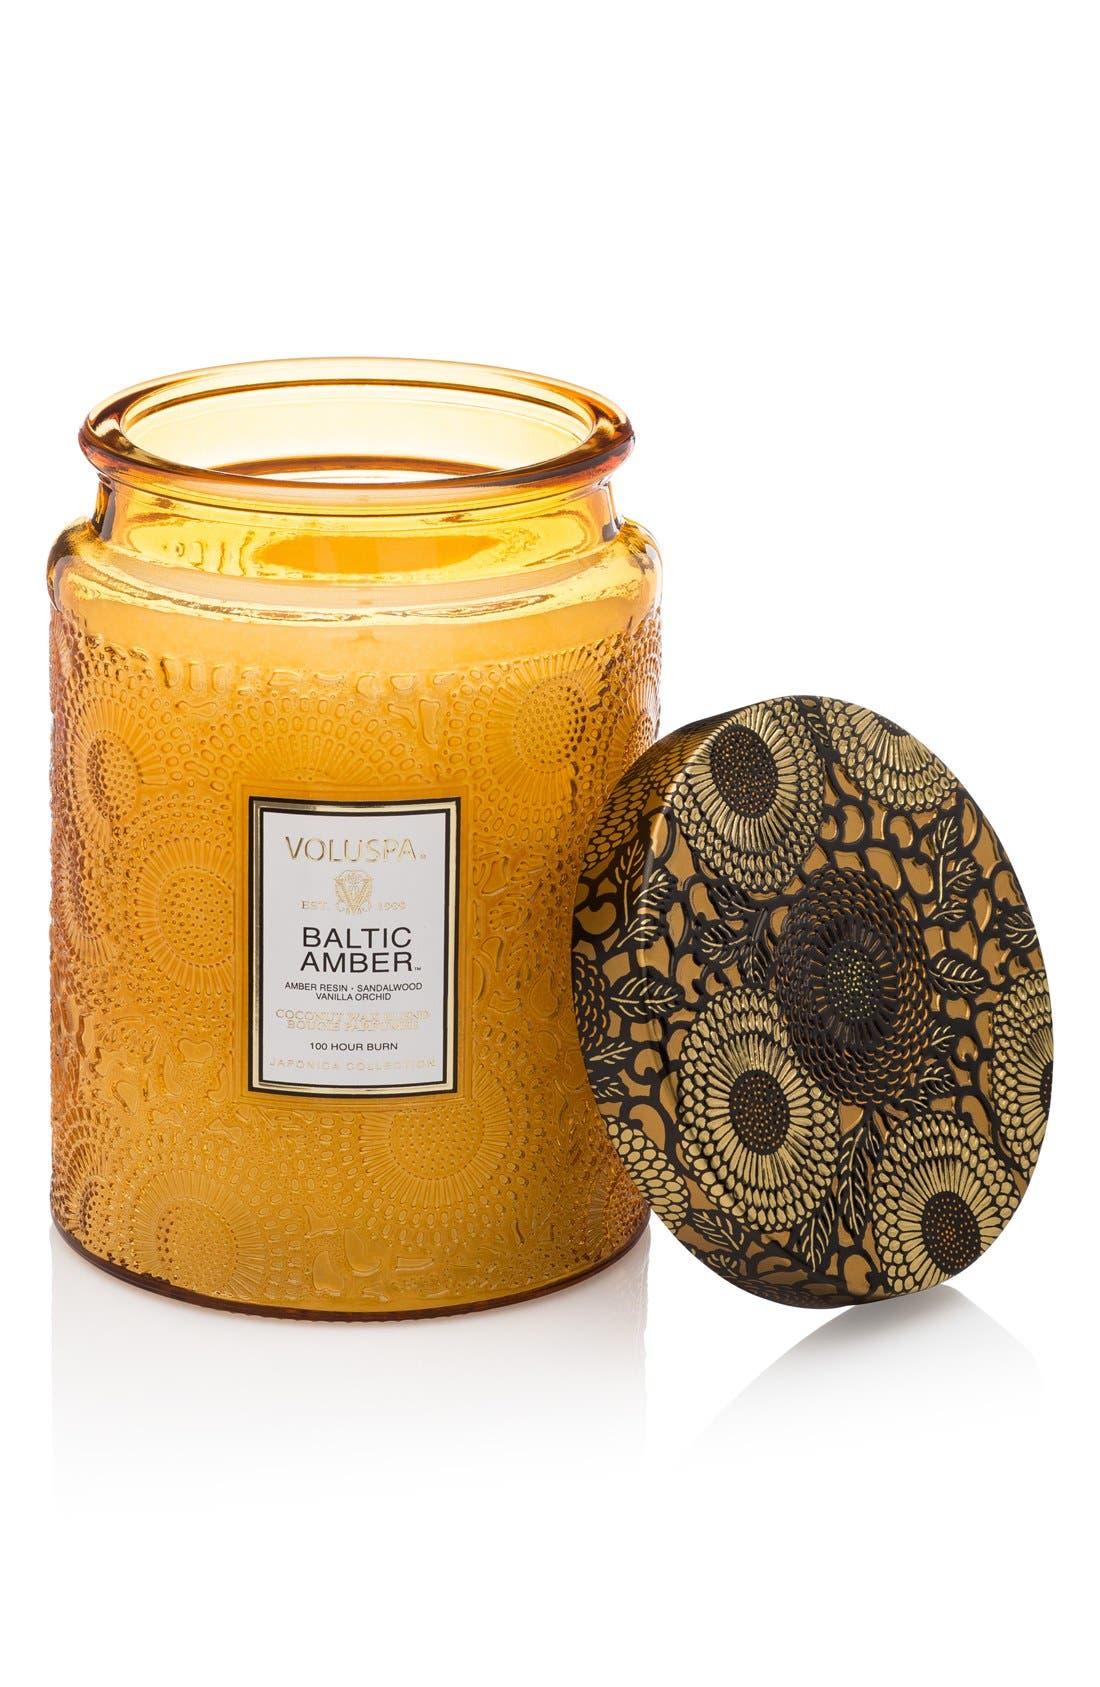 Voluspa Japonica Baltic Amber LargeGlass Jar Candle